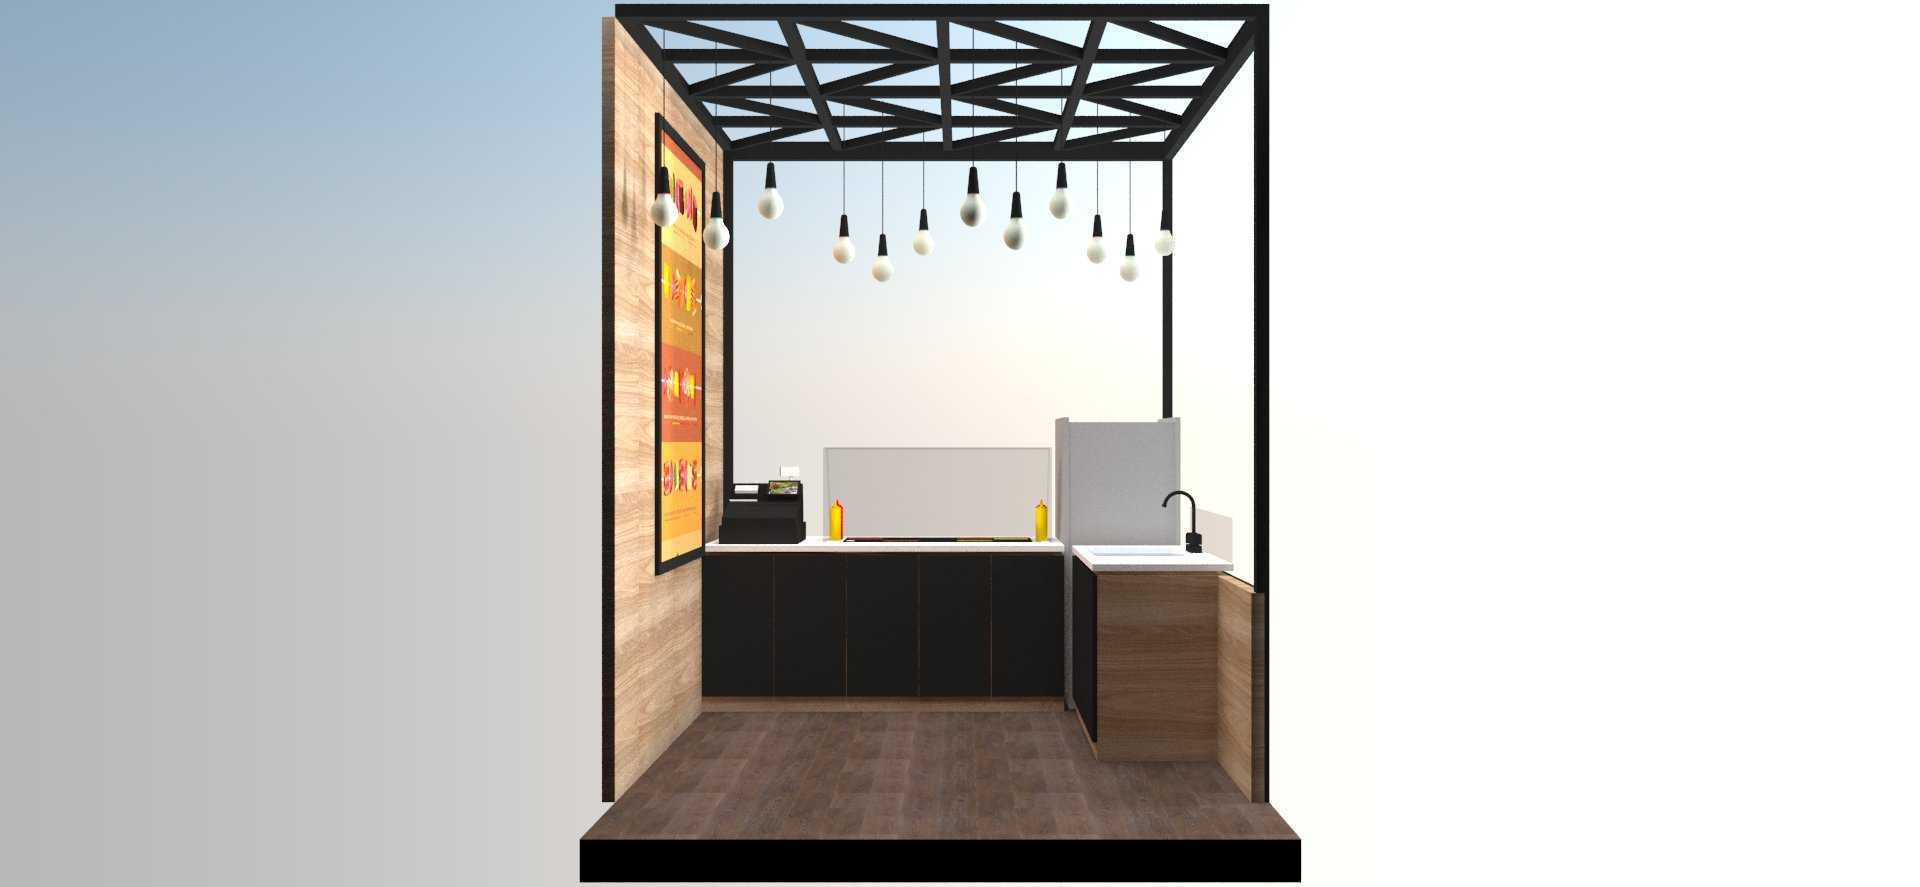 Virr Studio Kabob Premium Kebab Bandung Indah Plaza Citarum, Bandung Wetan, Bandung City, West Java 40117, Indonesia Citarum, Bandung Wetan, Bandung City, West Java 40117, Indonesia 03 Industrial,kontemporer,modern  36251